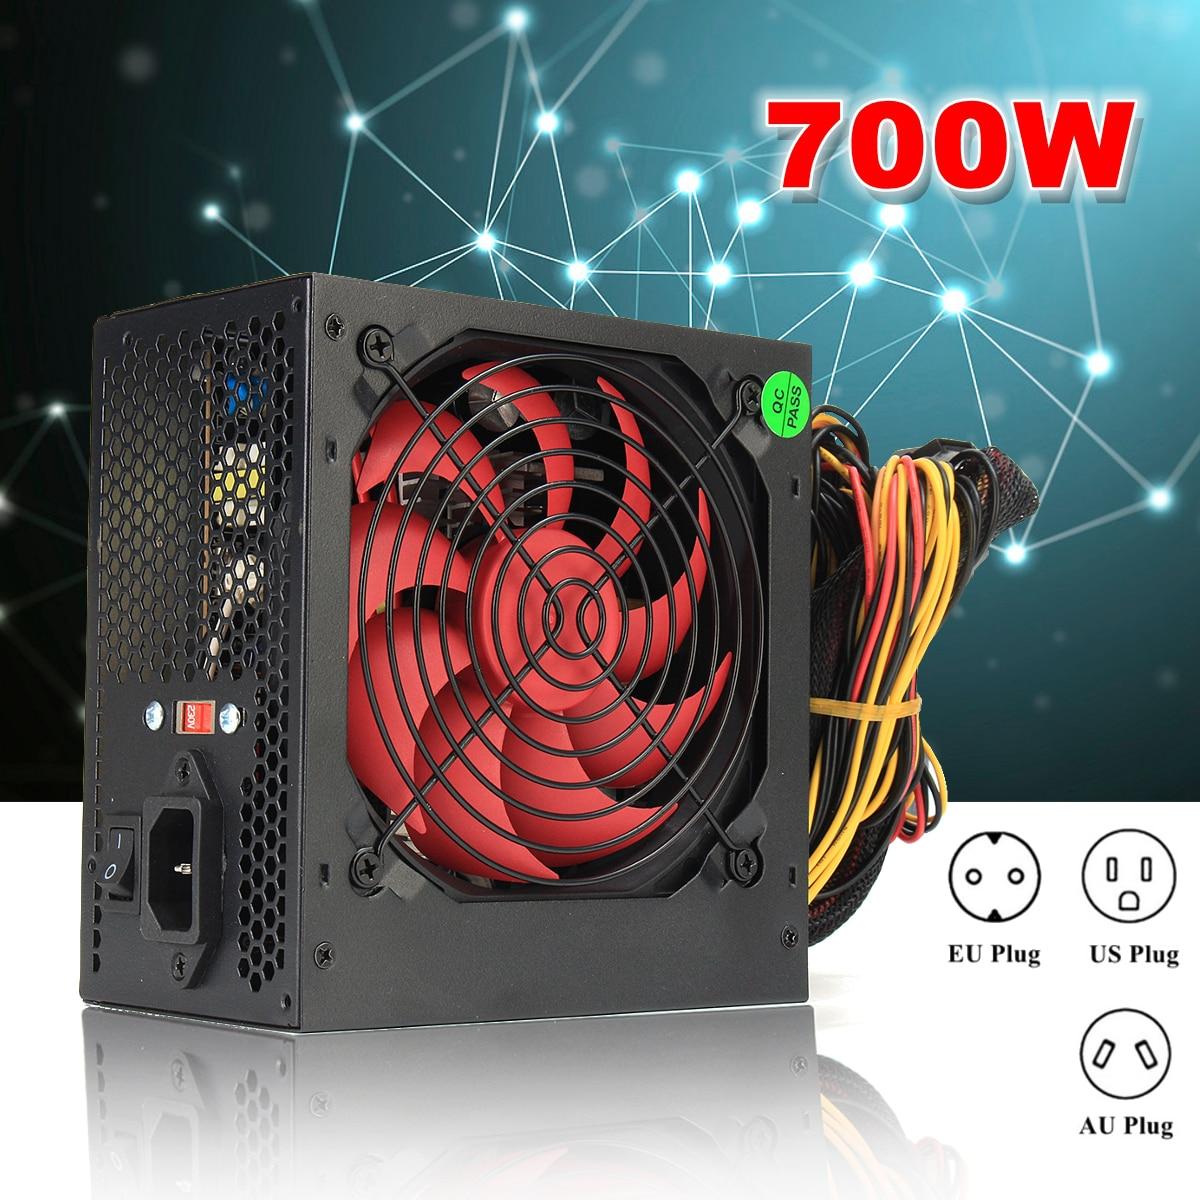 все цены на EU/AU/US MAX 700W PCI SATA ATX 12V Gaming PC Power Supply 24Pin /Molex /Sata 700Walt 12CM Fan New Computer Power Supply For BTC онлайн